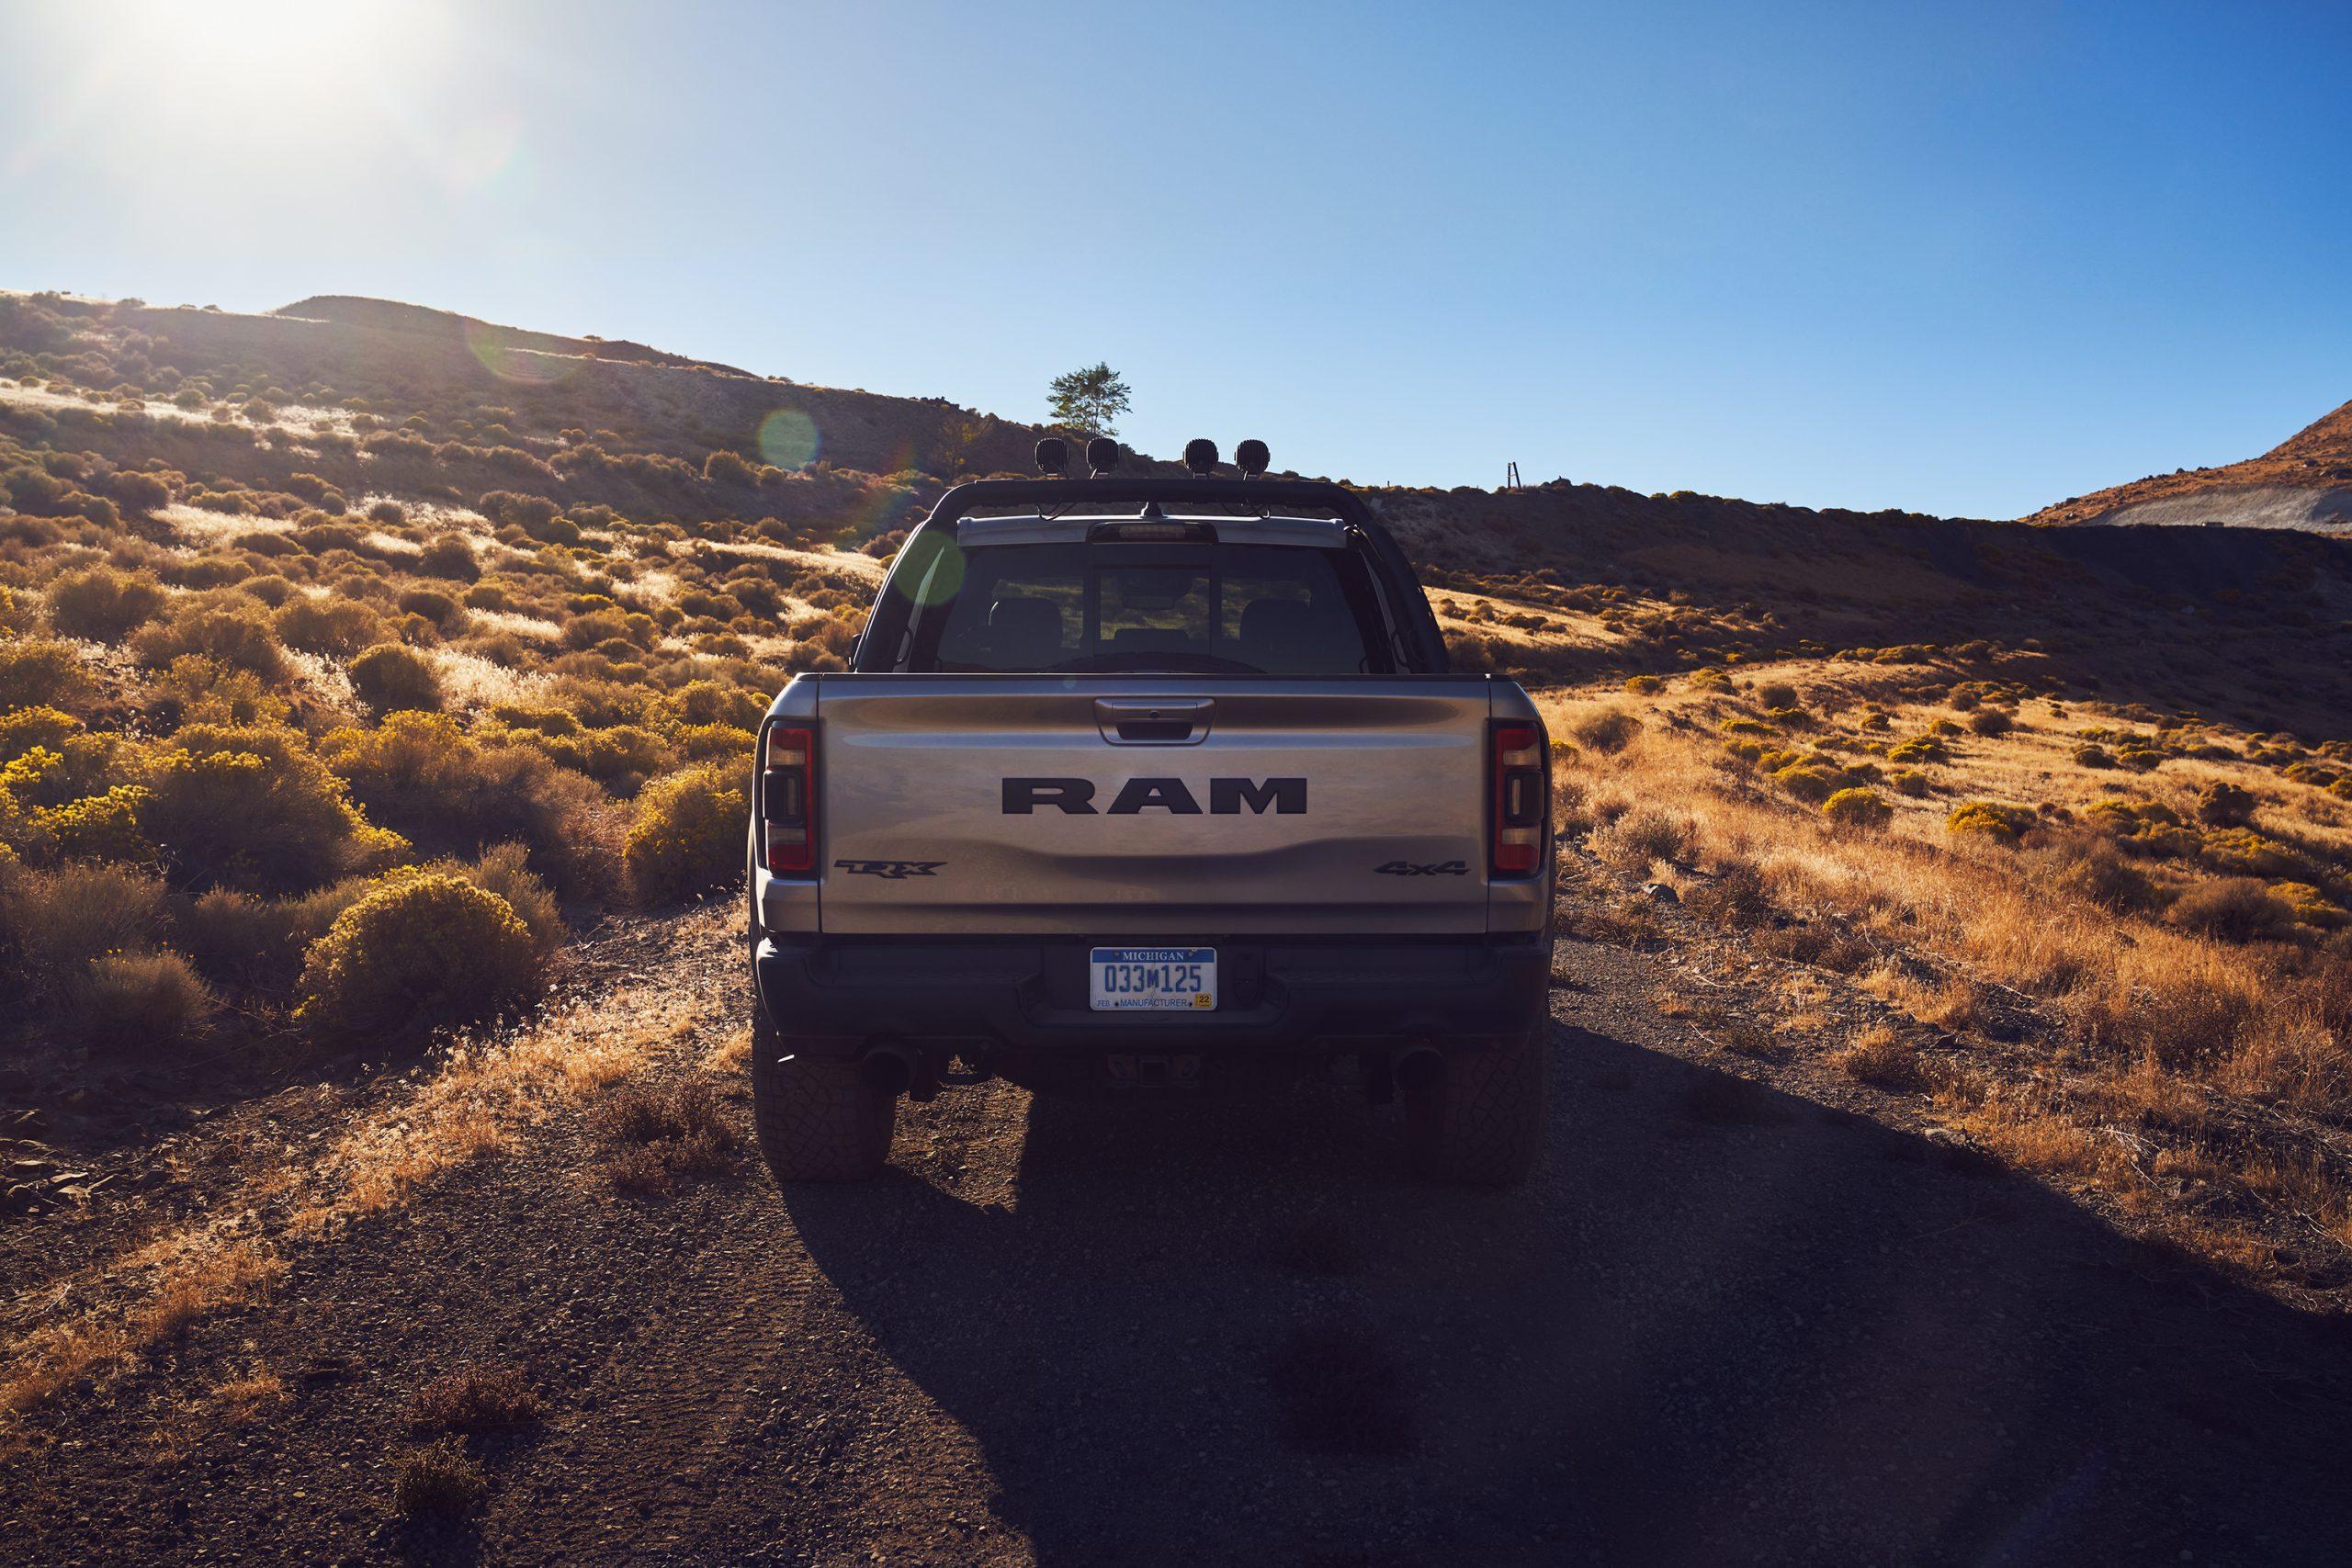 2021 Ram 1500 TRX rear